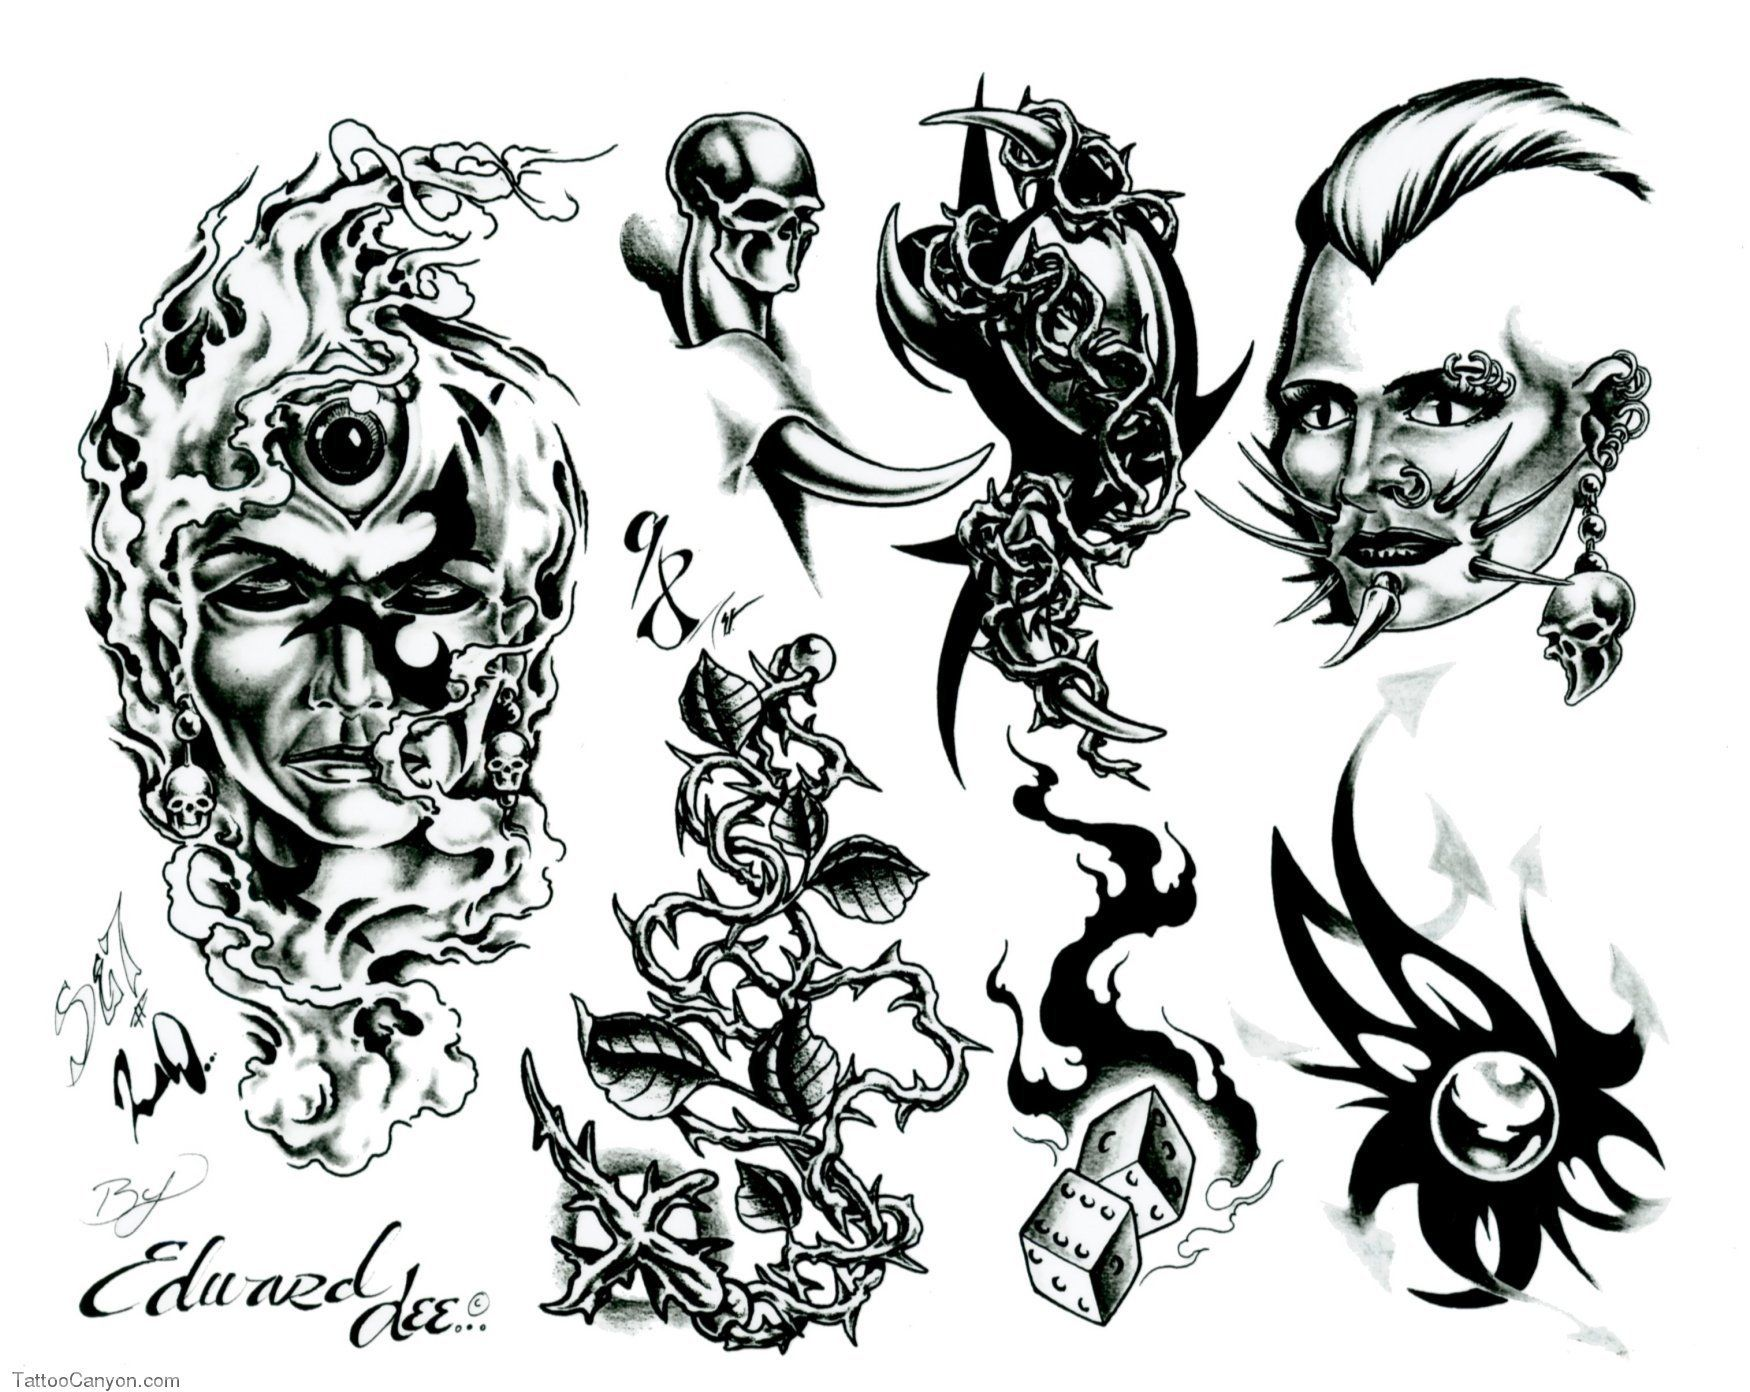 Free tattoos designs download - More Free Tribal Tattoo Flash Download Tribal Tattoo Flash Designs